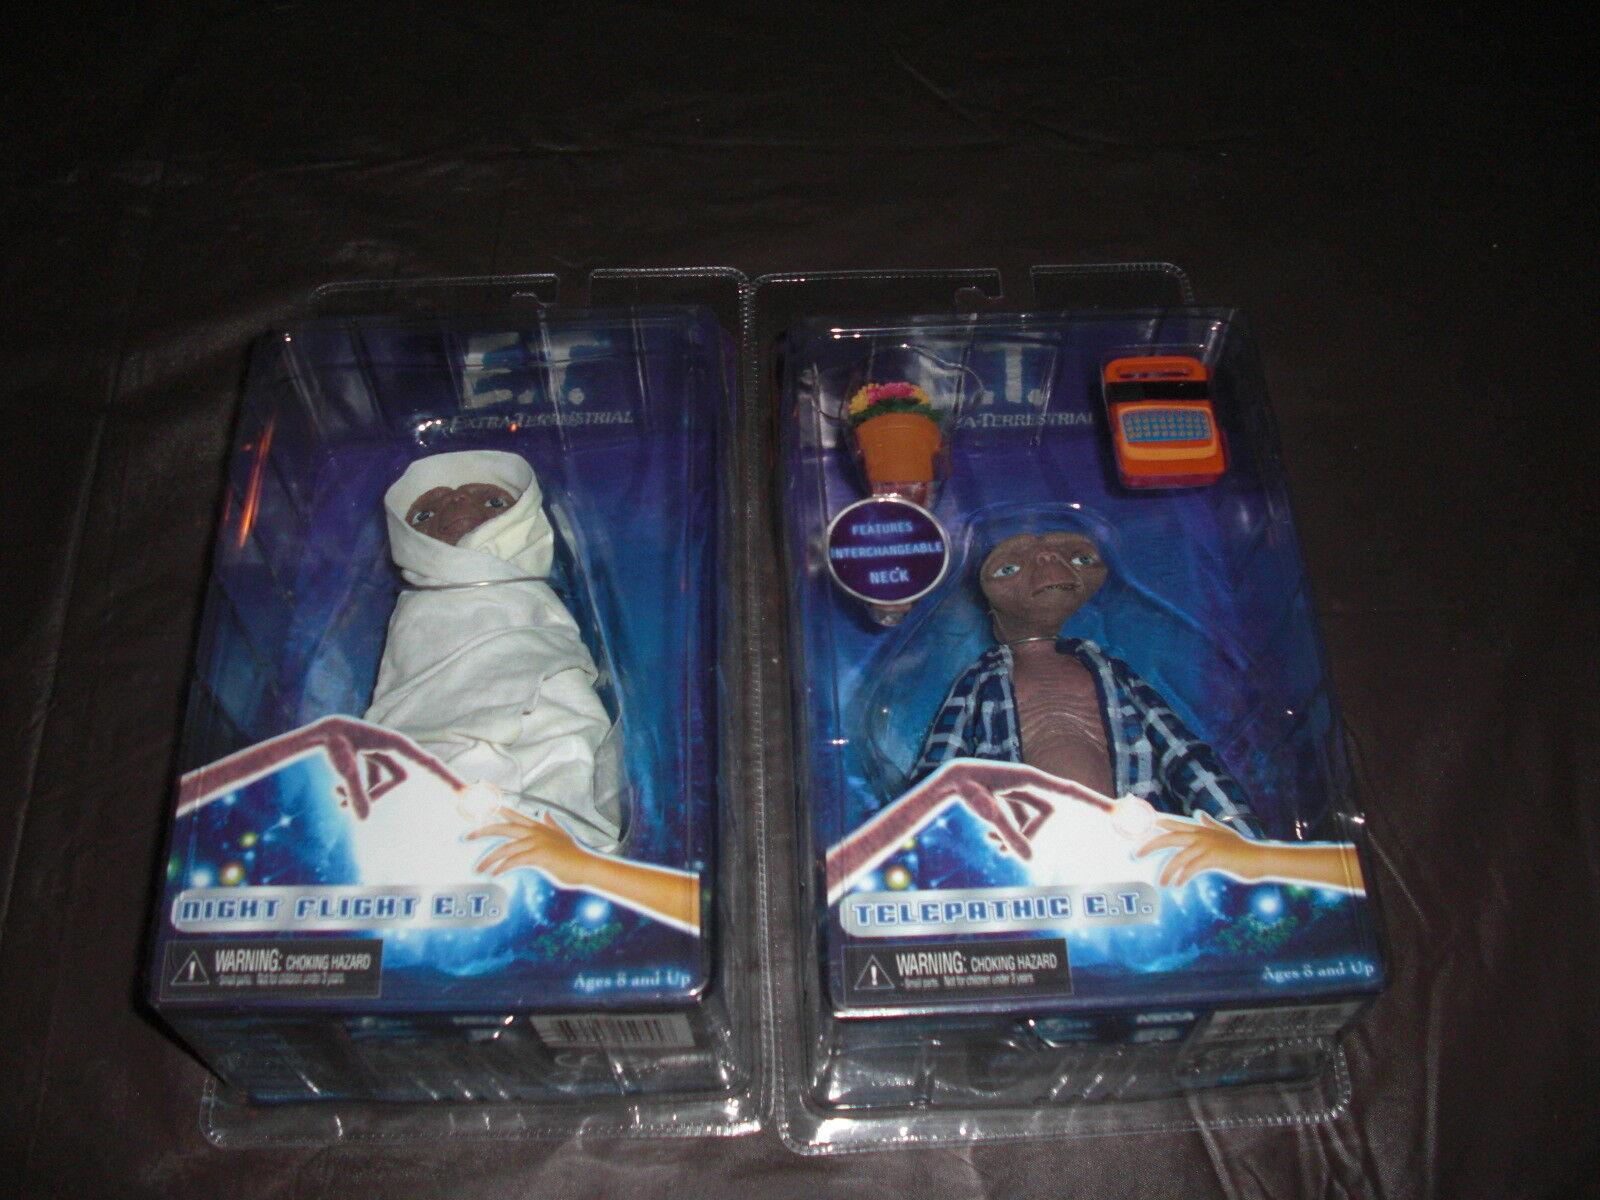 NECA E.T. SERIES 2 NIGHT FLIGHT E.T. AND TELEPATHIC E.T. SET OF 2 FIGURES MISP